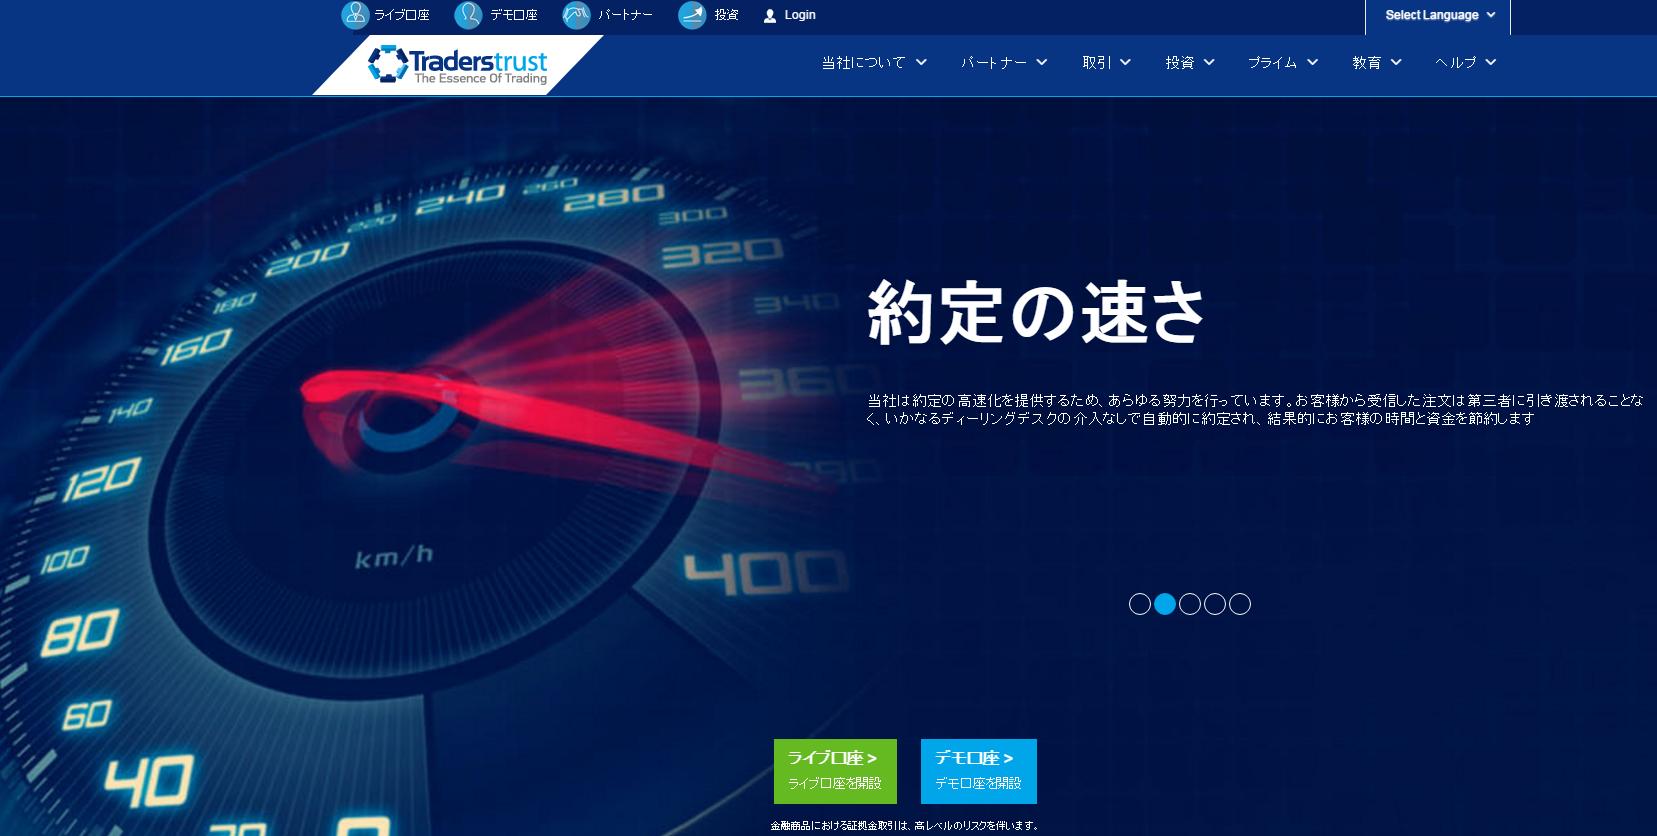 Traders Trust新ウェブサイト